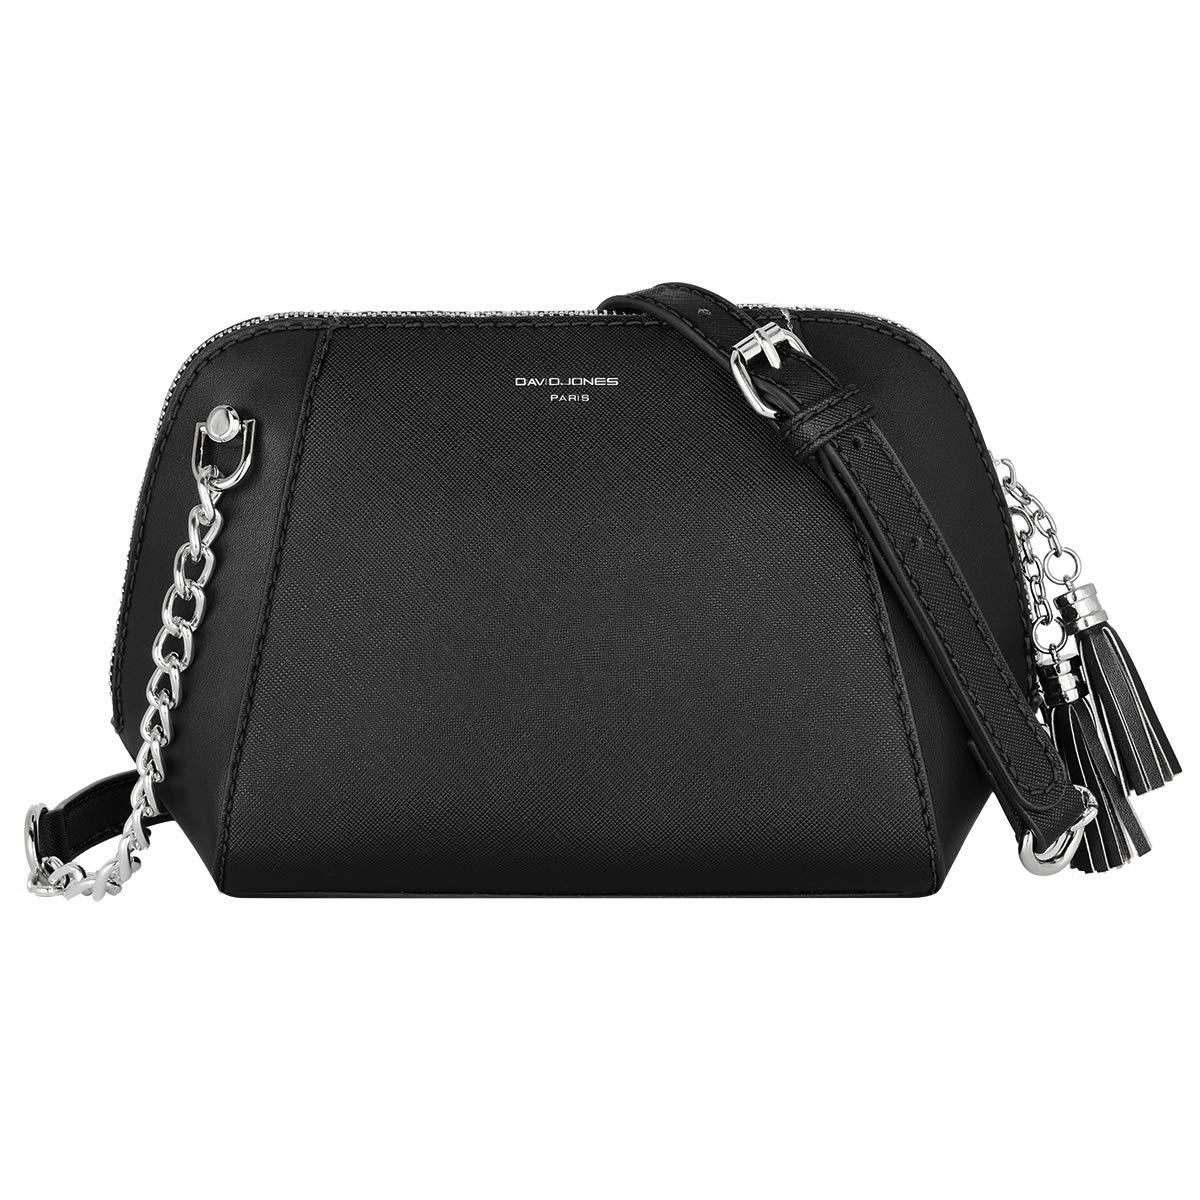 ef3bf3b79 David Jones - Women's Small Chain Crossbody Bag - Trapeze Shoulder Handbag  PU Leather - Messenger Crossbody Bag Zipper Mini - Evening Party Clutch  Purse ...